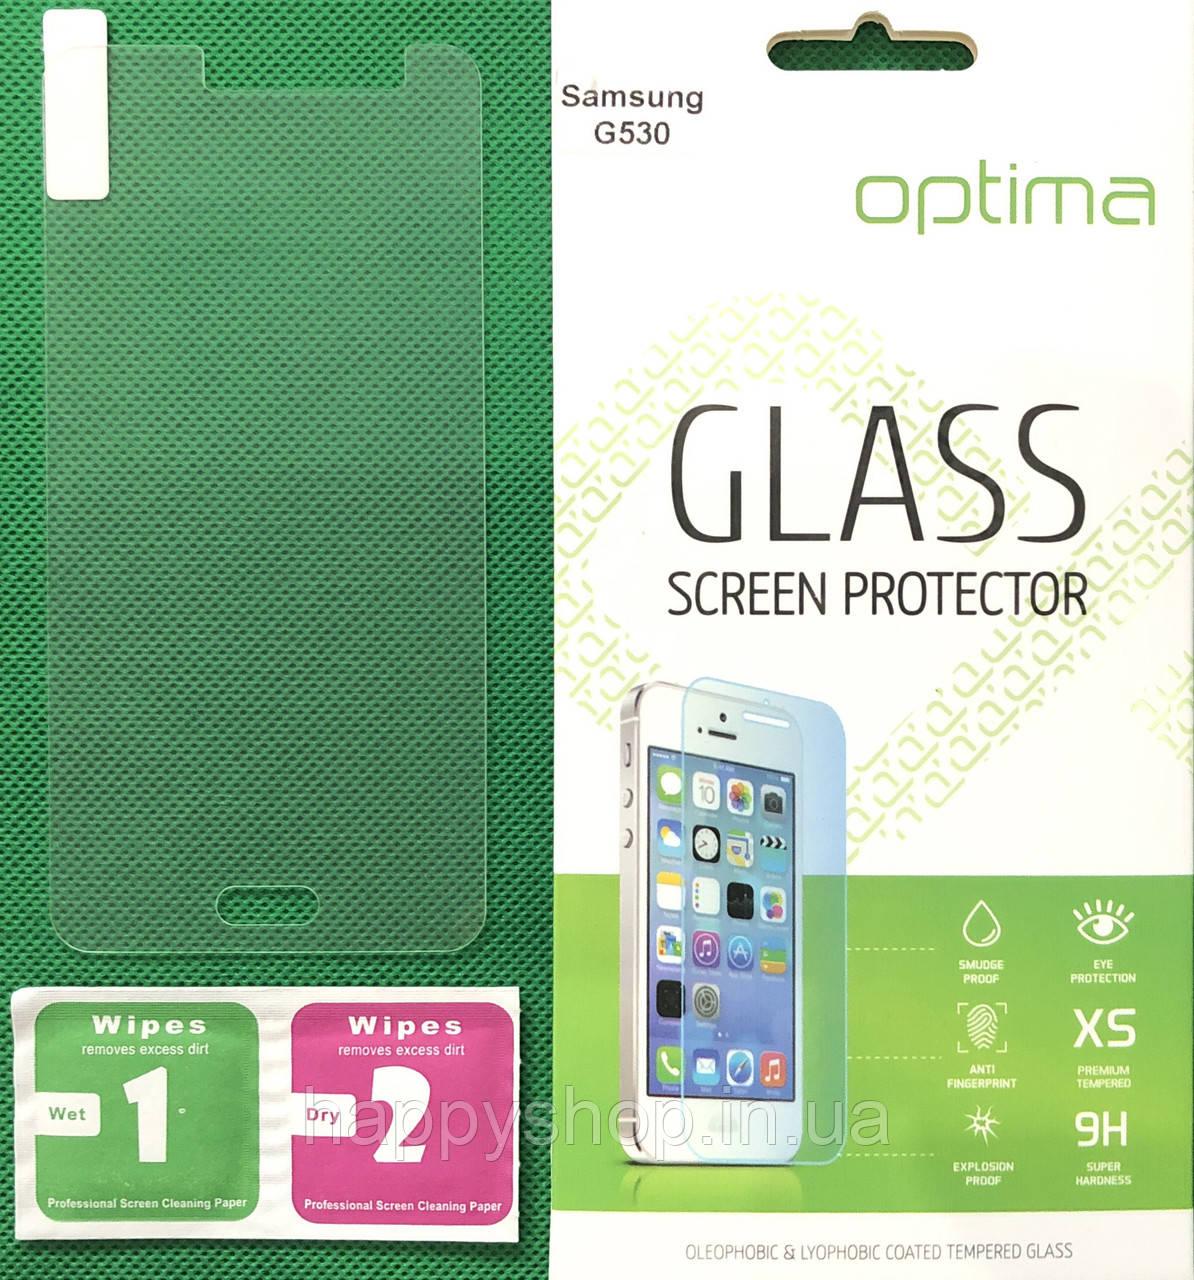 Захисне скло для Samsung Galaxy Grand Prime G530, G531